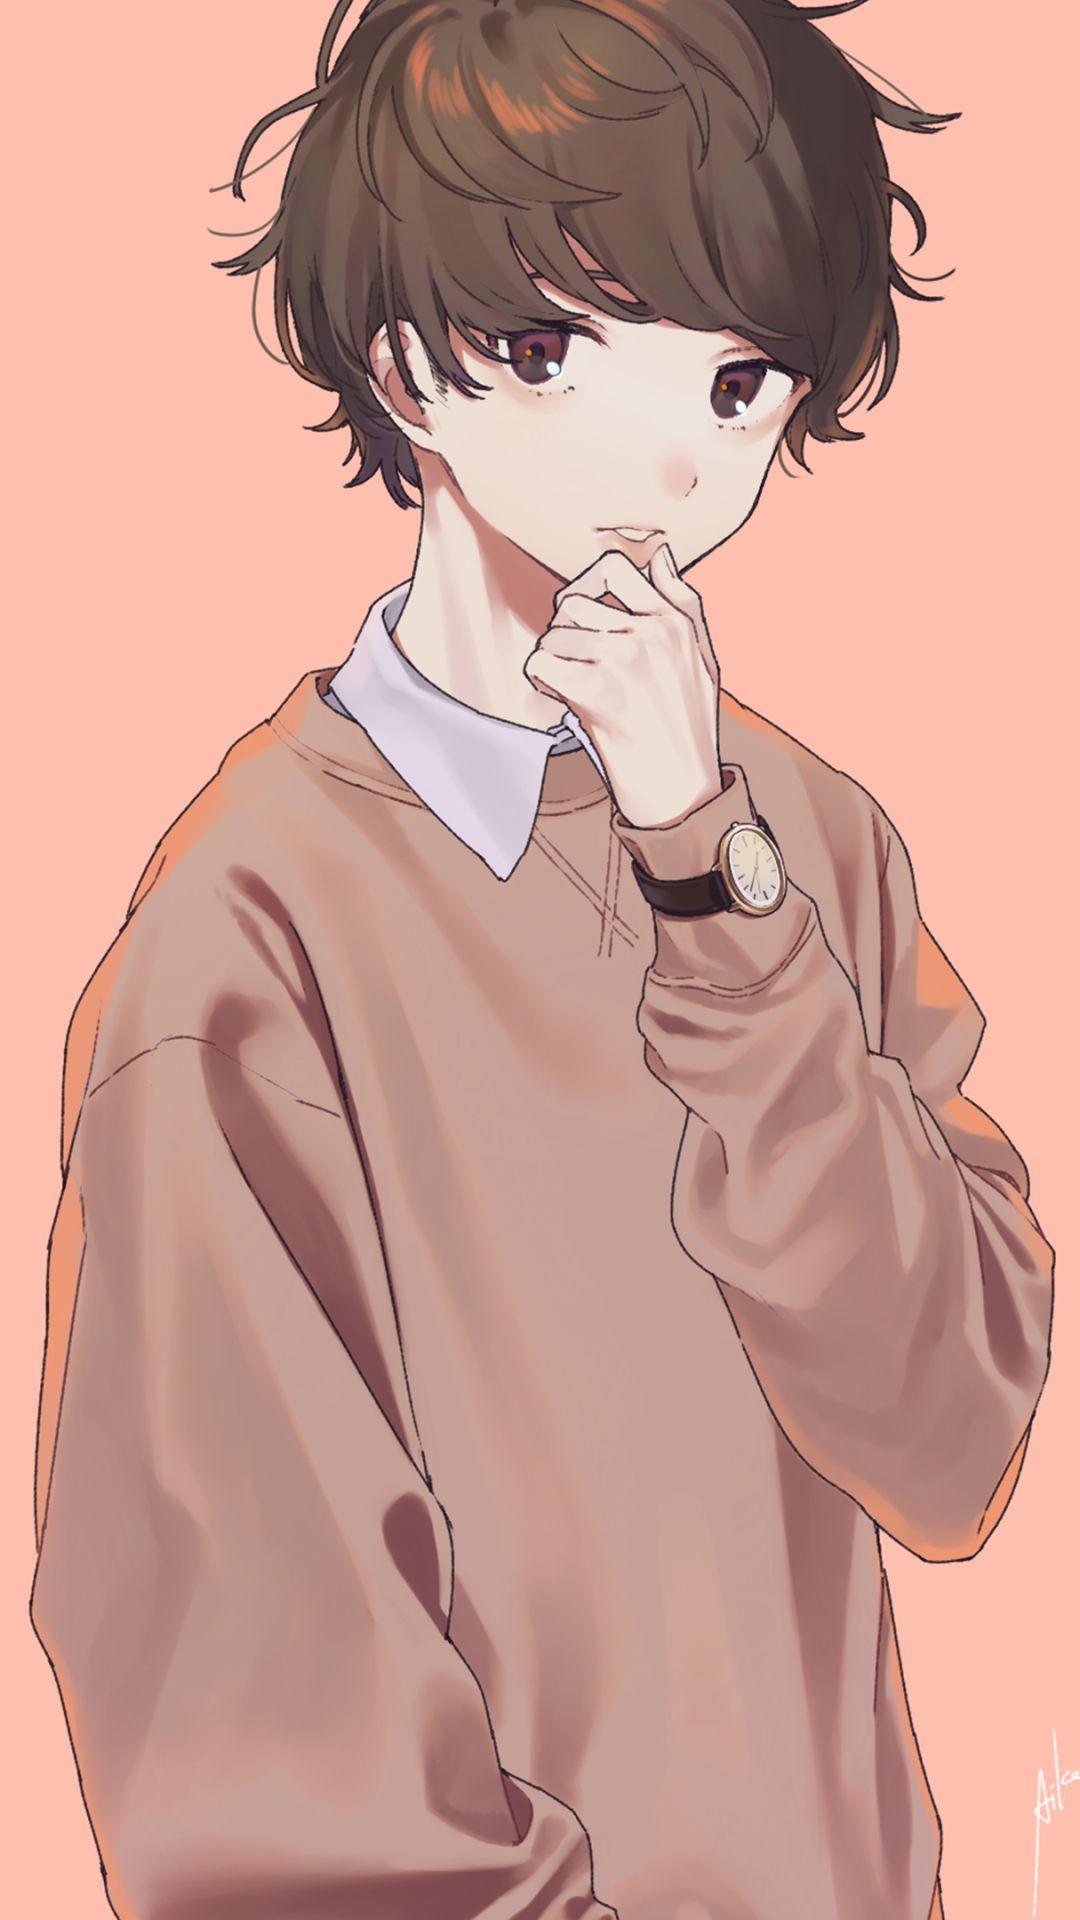 Cool Wallpaper Anime Boy Mywallpapers Site Anime Drawings Boy Anime Boy Anime Love